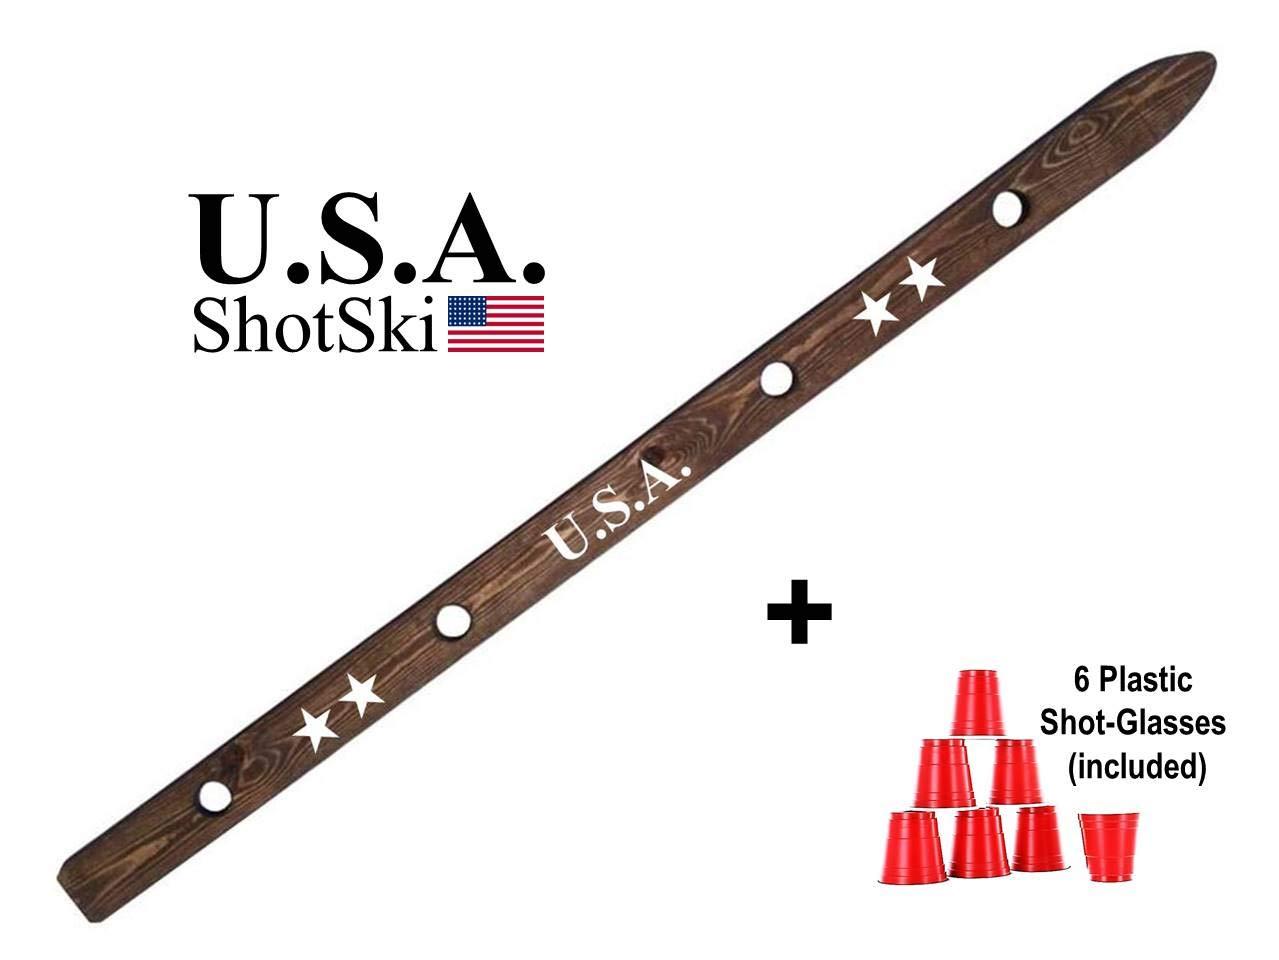 ShotSki USA Wood Shot Ski